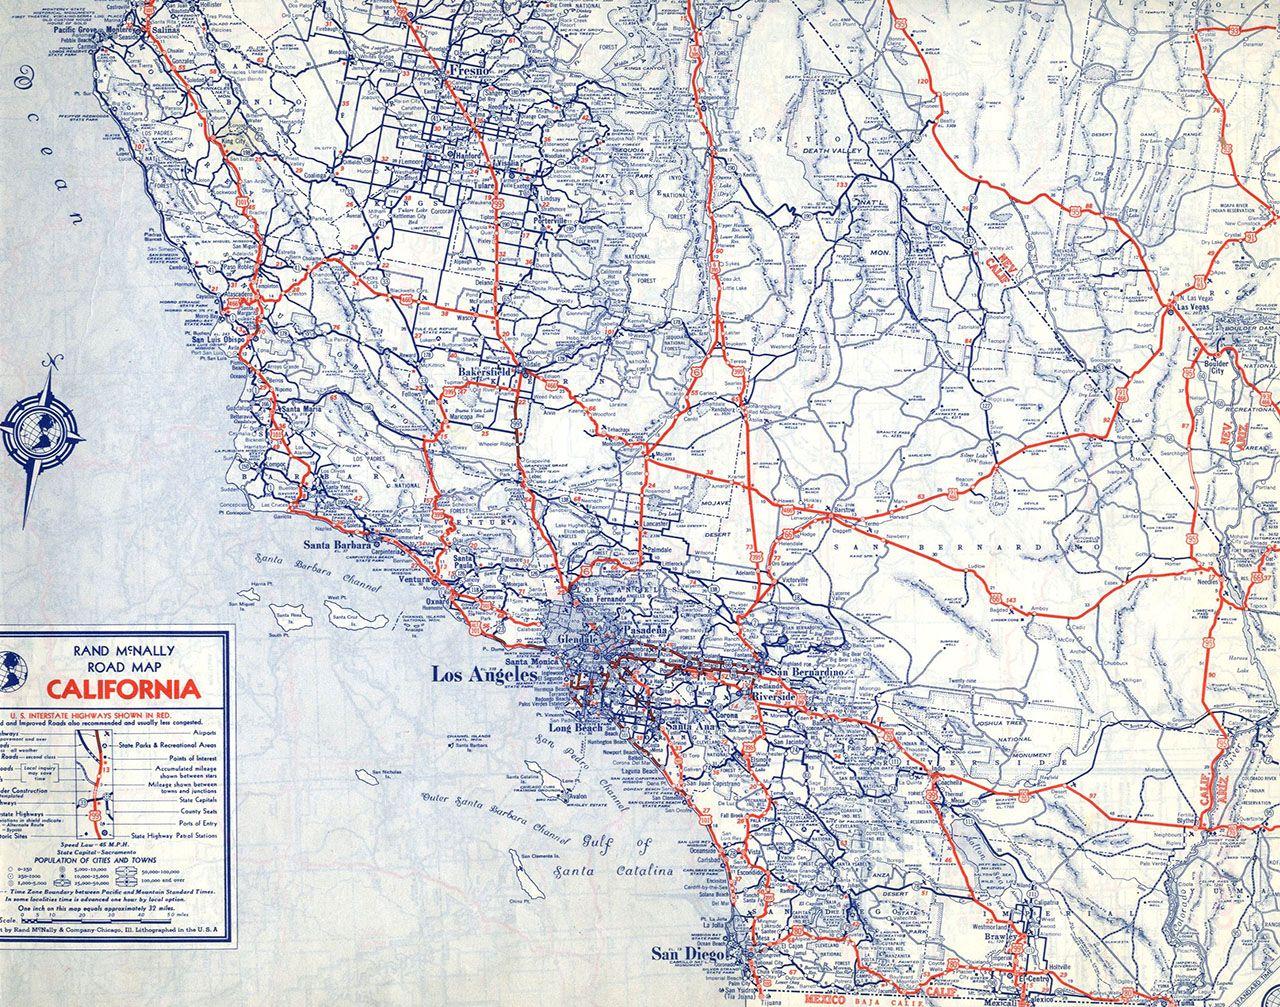 Southern California Map Pdf - Klipy - Southern California Road Map Pdf